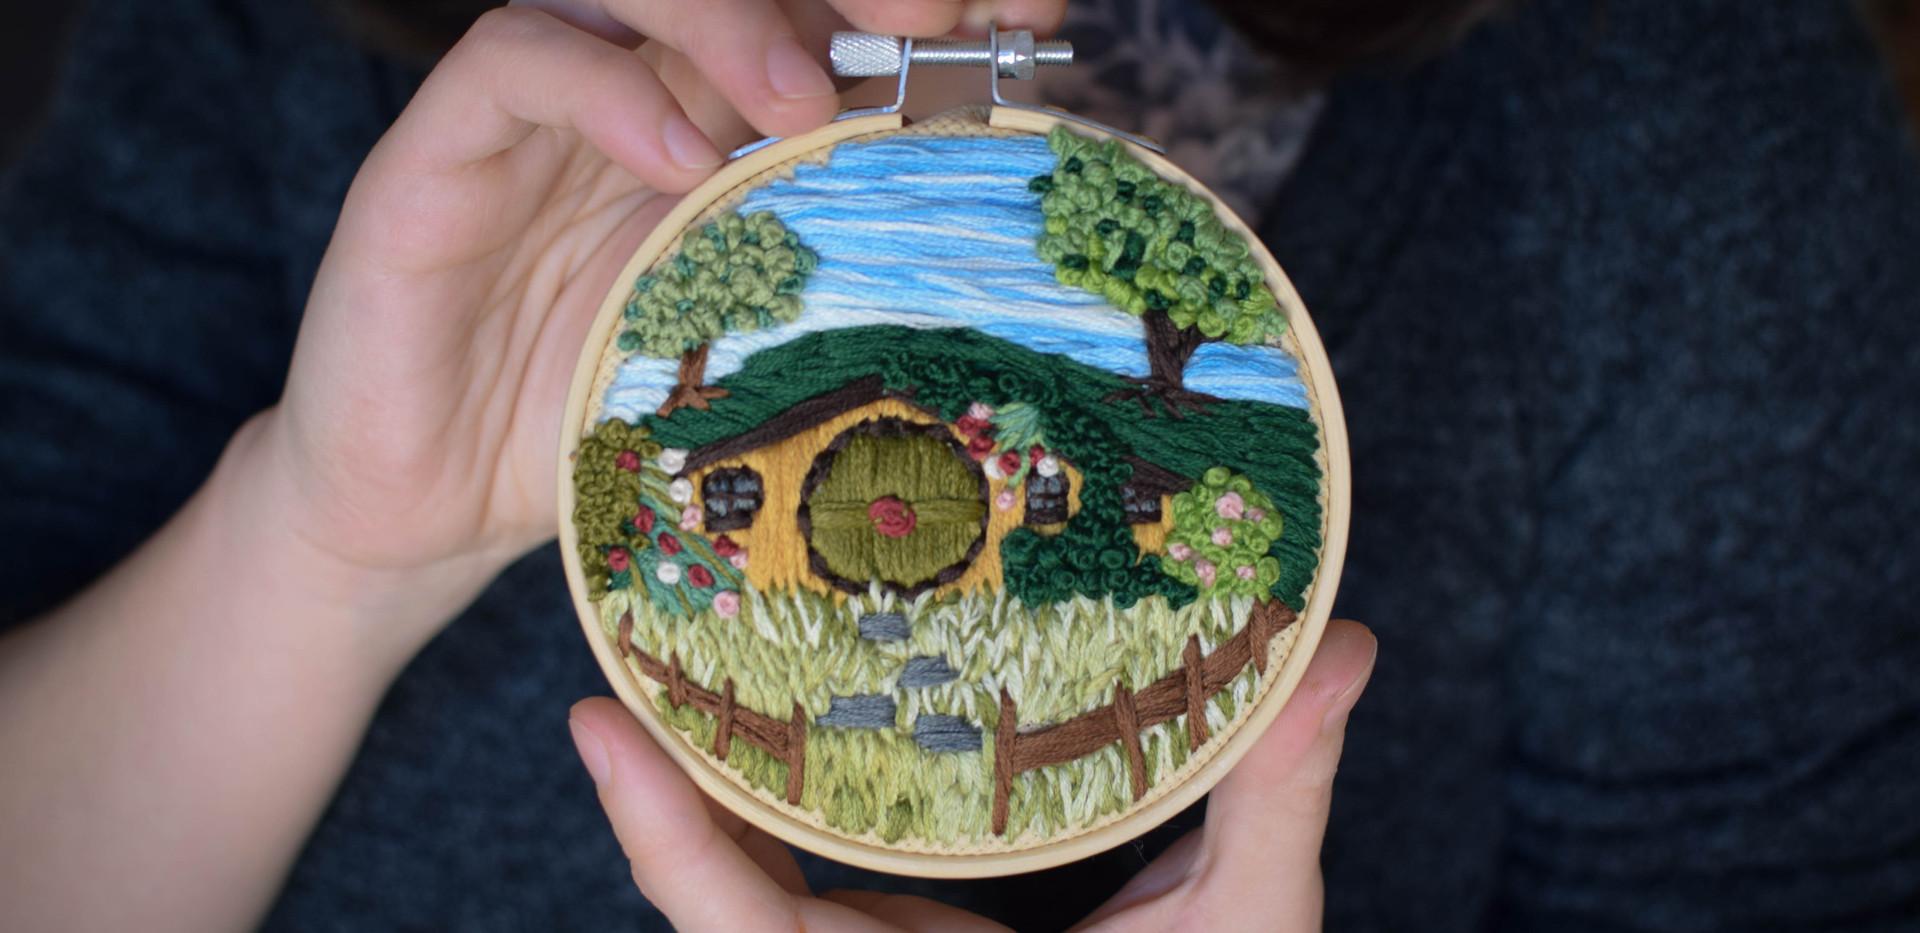 Broderie décorative ~Cul-de-Sac~ artisanale